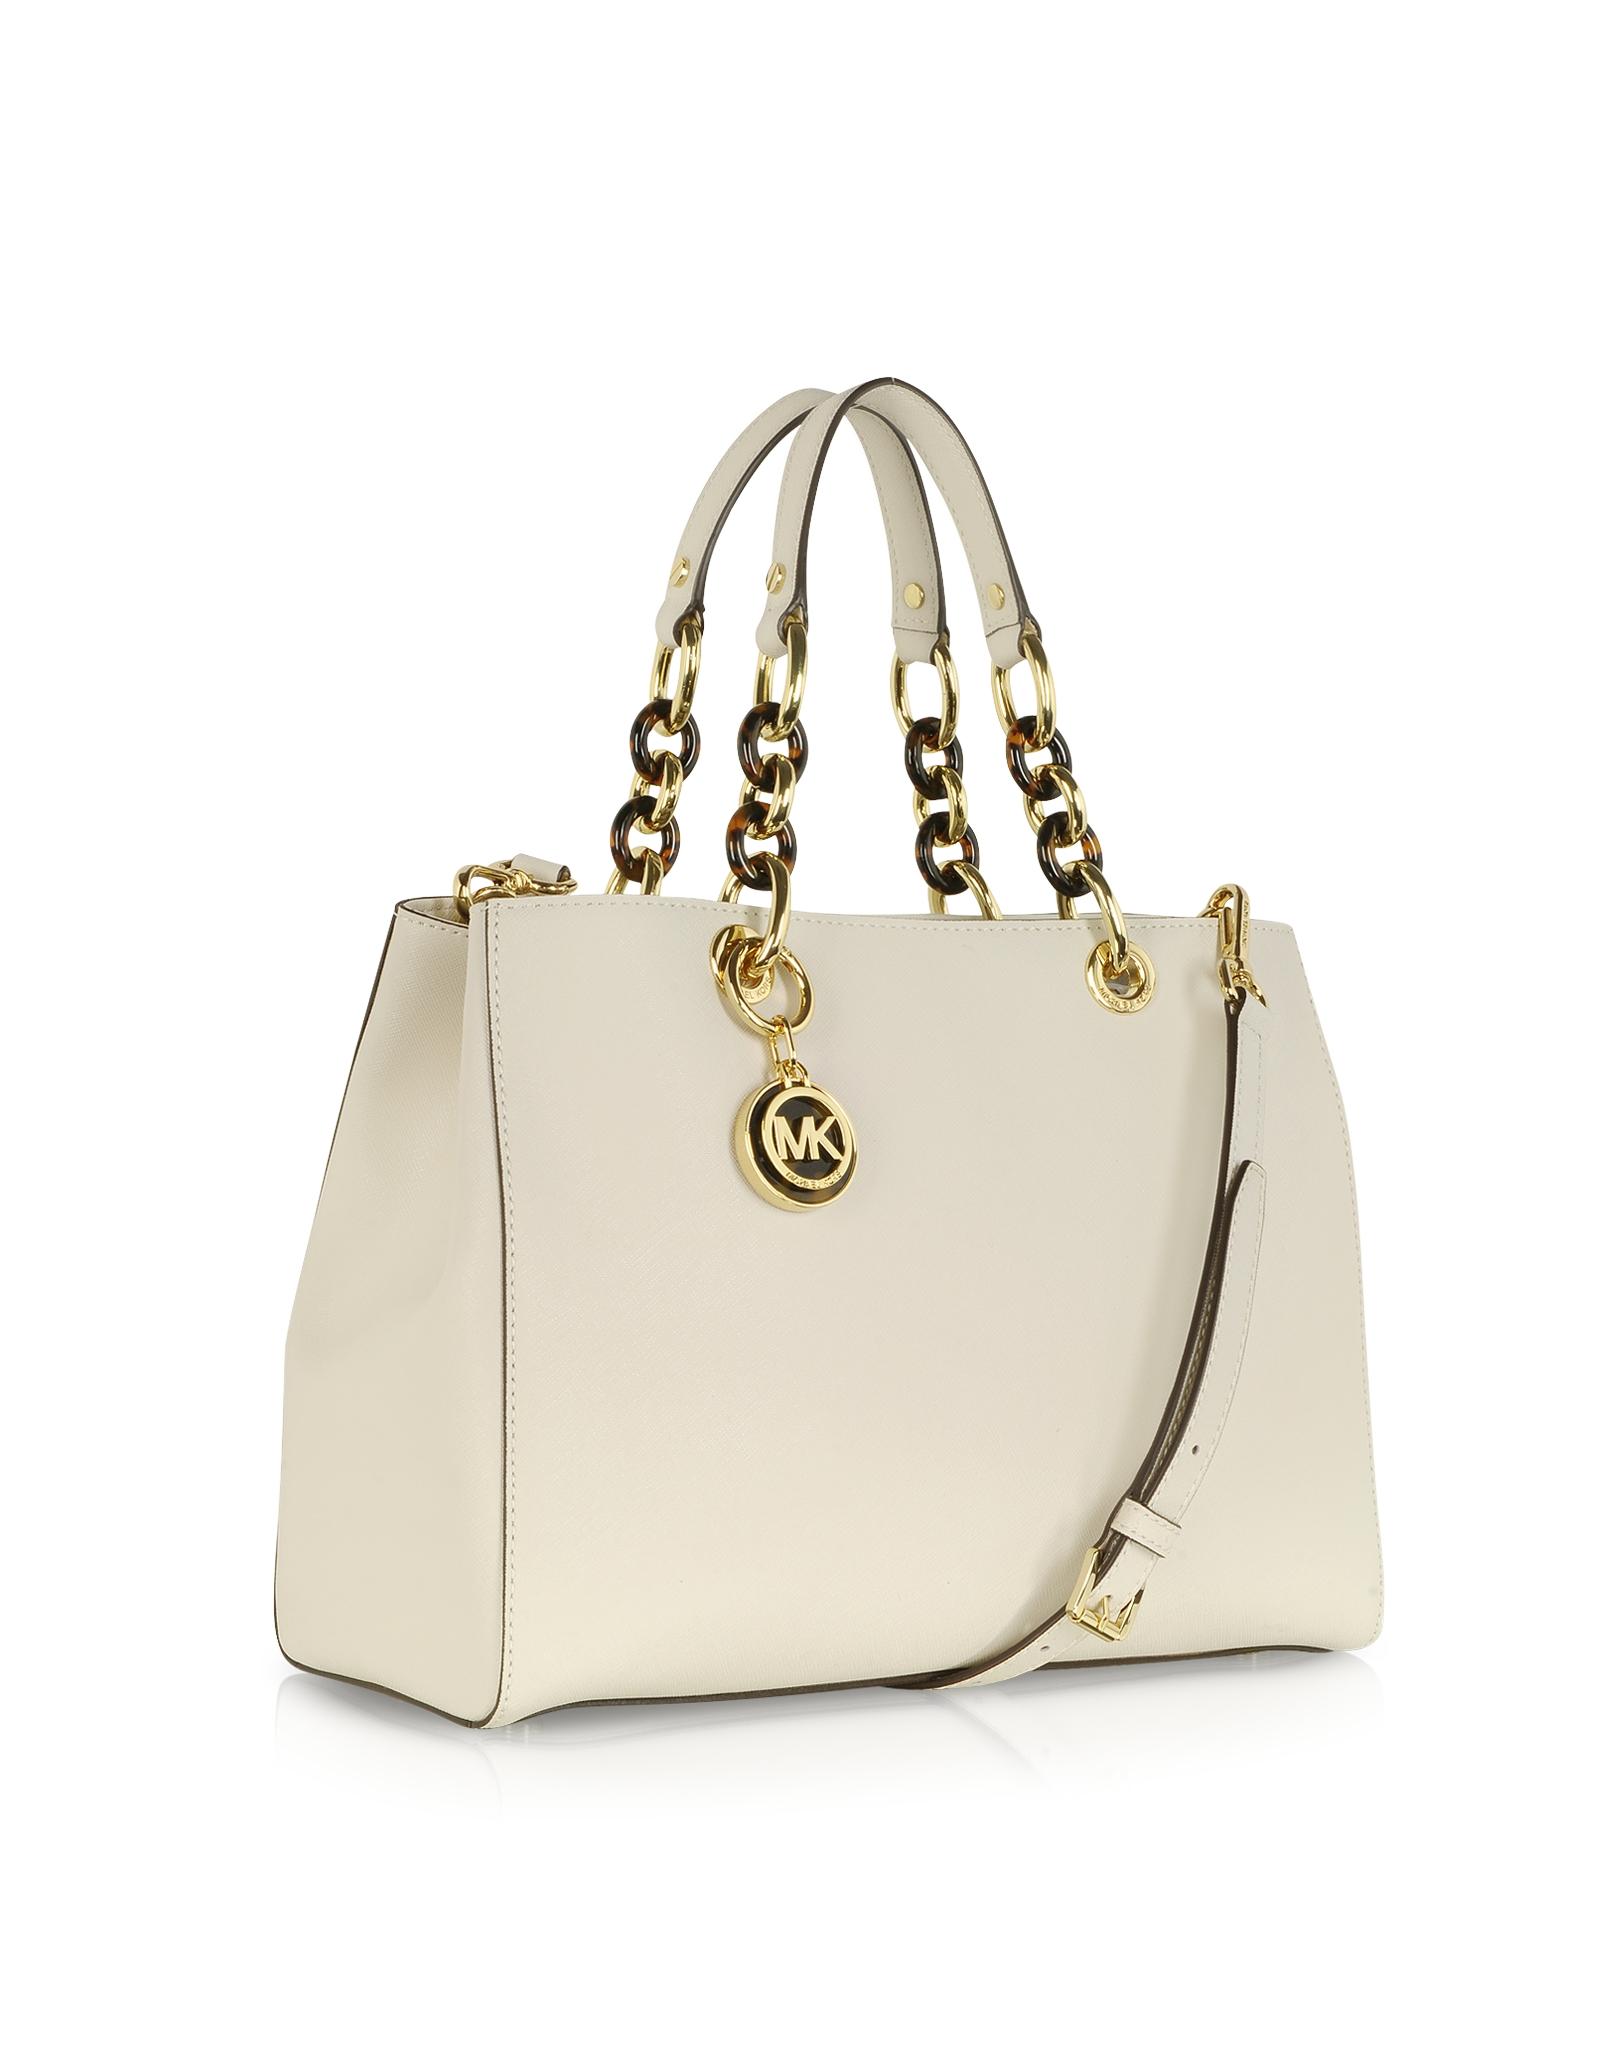 d4f6d668b662b ... bag acorn 490b7 1a43c  discount code for lyst michael kors cynthia  vanilla saffiano leather satchel in white 894c0 bbf63